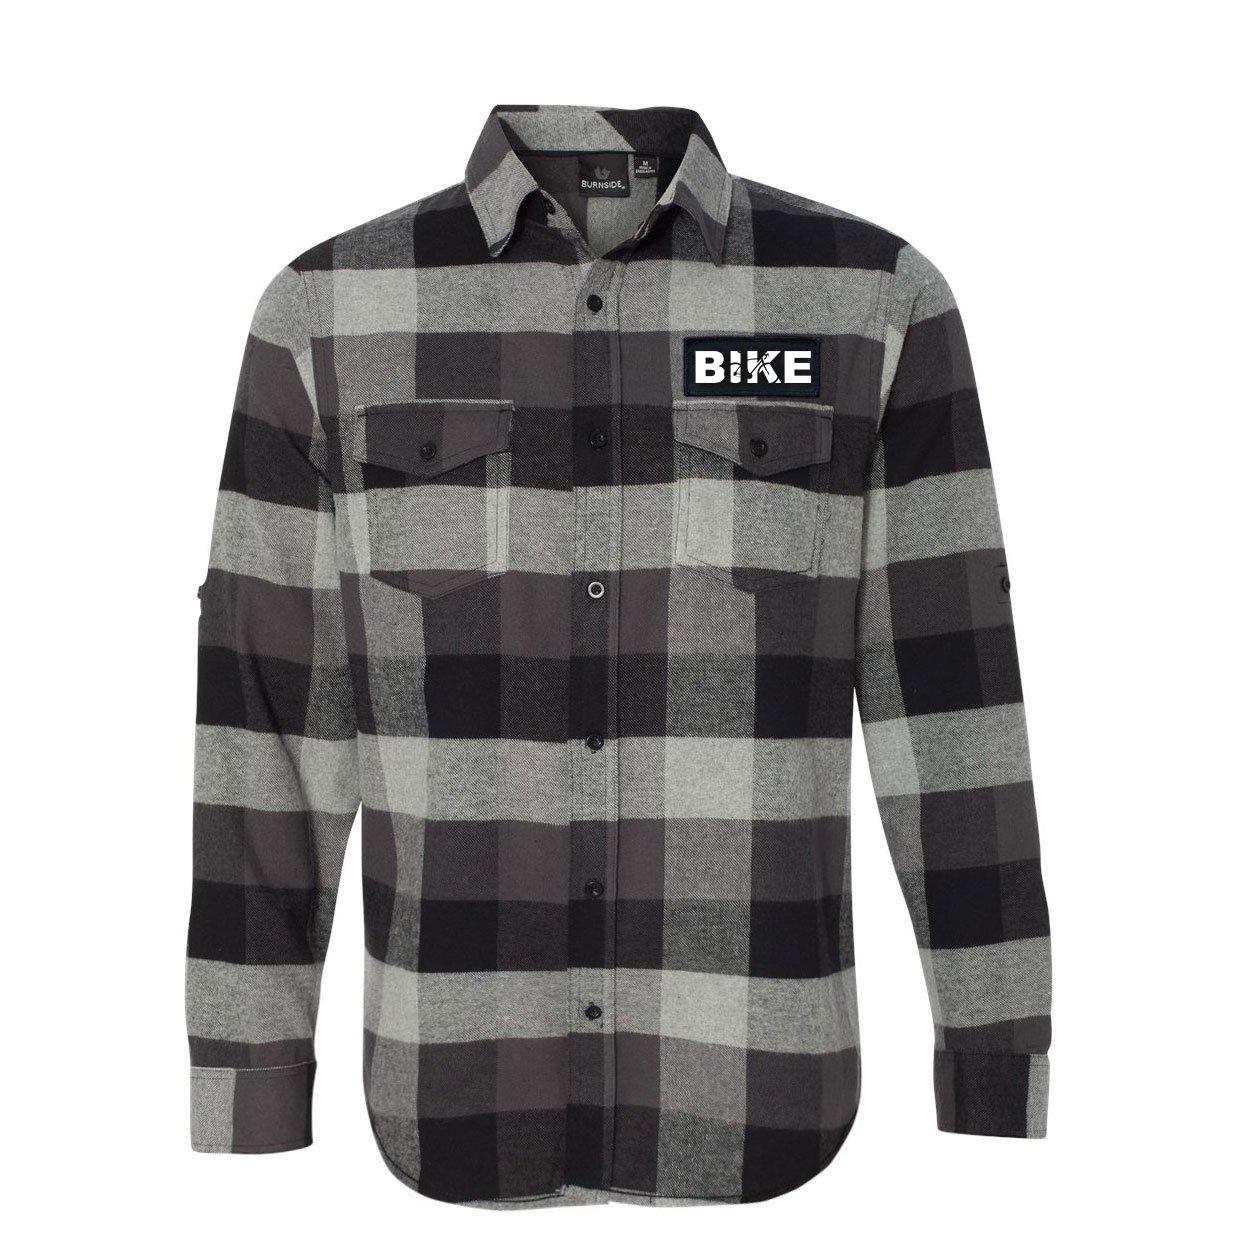 Bike Cycling Logo Classic Unisex Long Sleeve Woven Patch Flannel Shirt Black/Gray (White Logo)